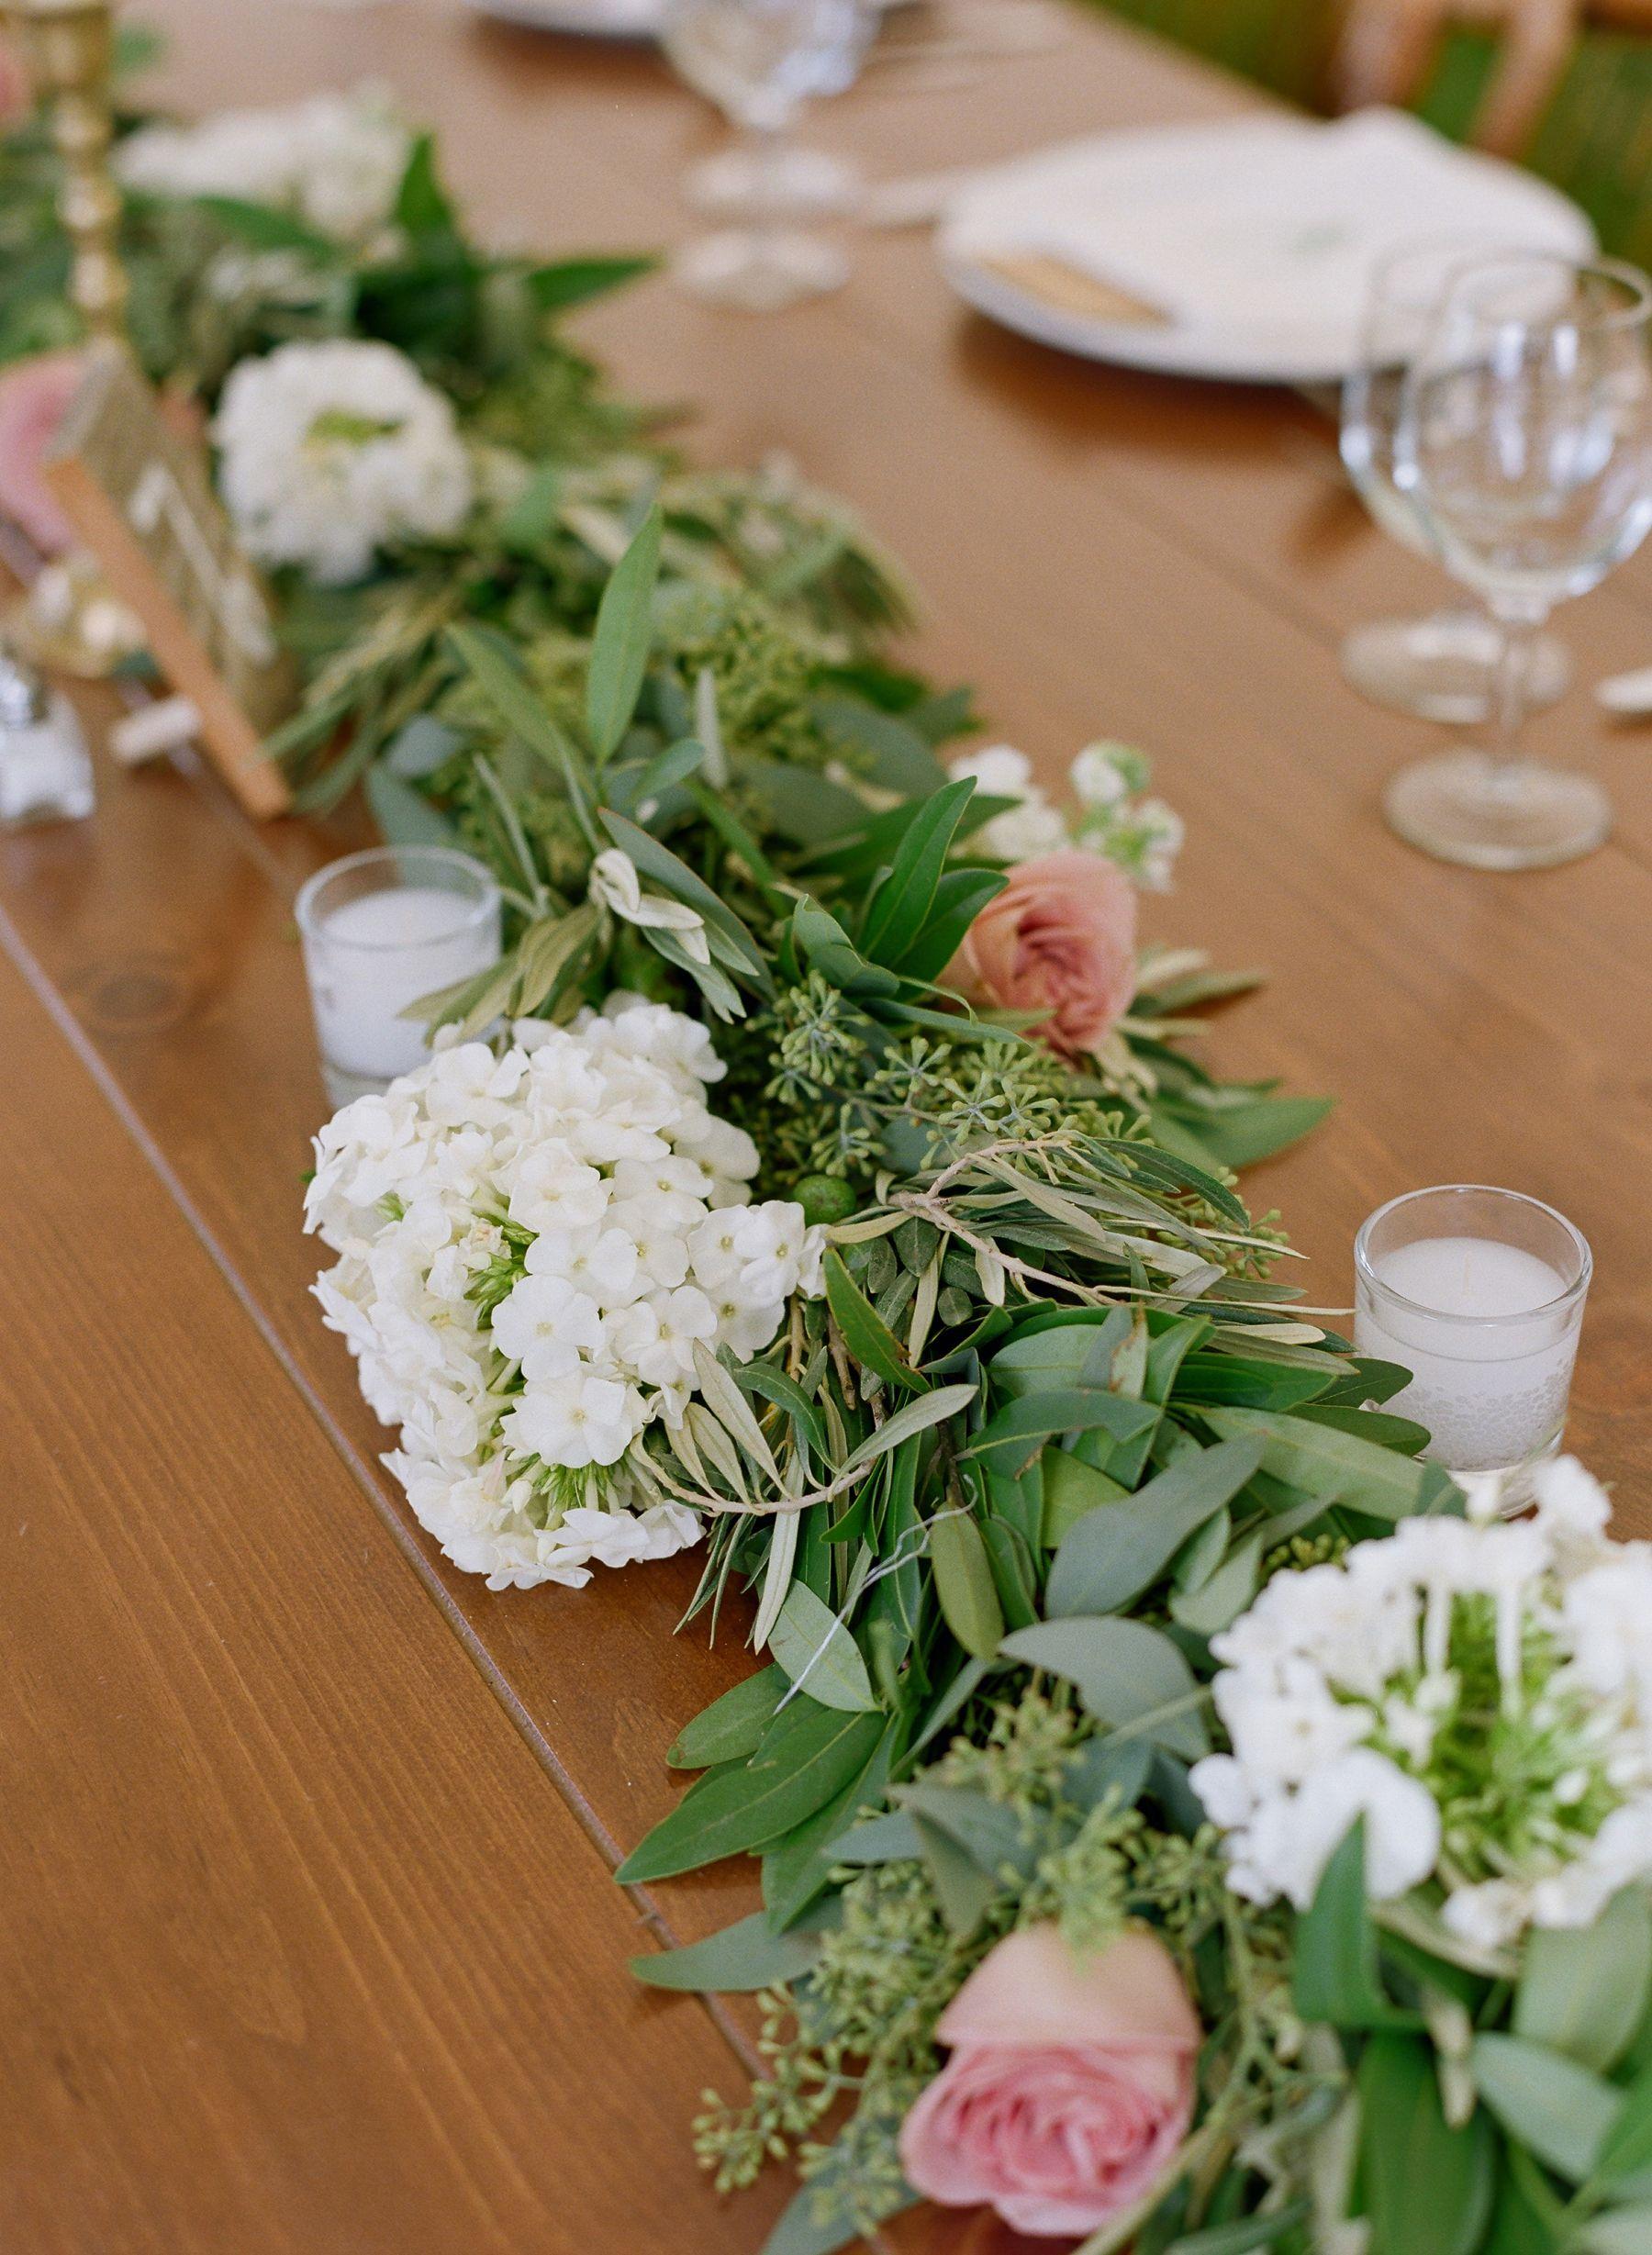 White Hydrangea Seeded Eucalyptus Garland Reception Centerpieces Wedding Table Garland Reception Centerpieces White Hydrangea